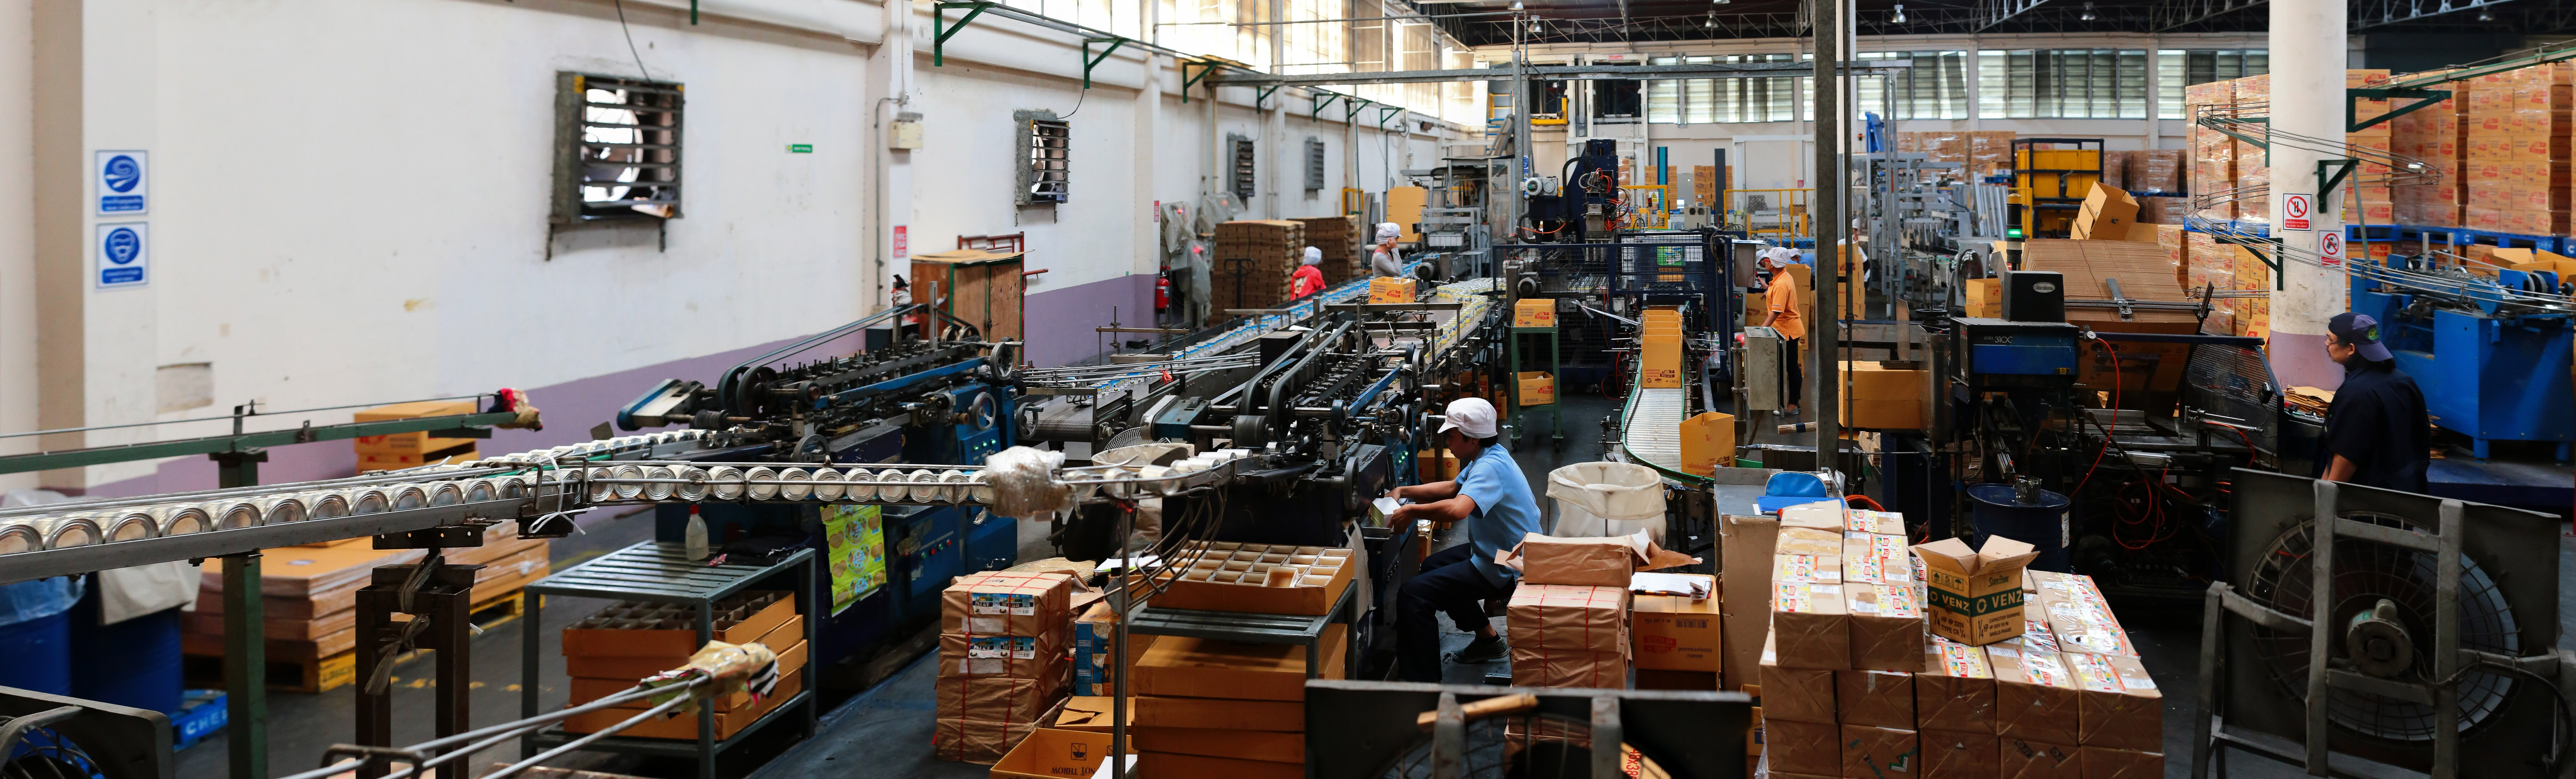 work-man-working-line-industrial-machine-737450-pxhere.com